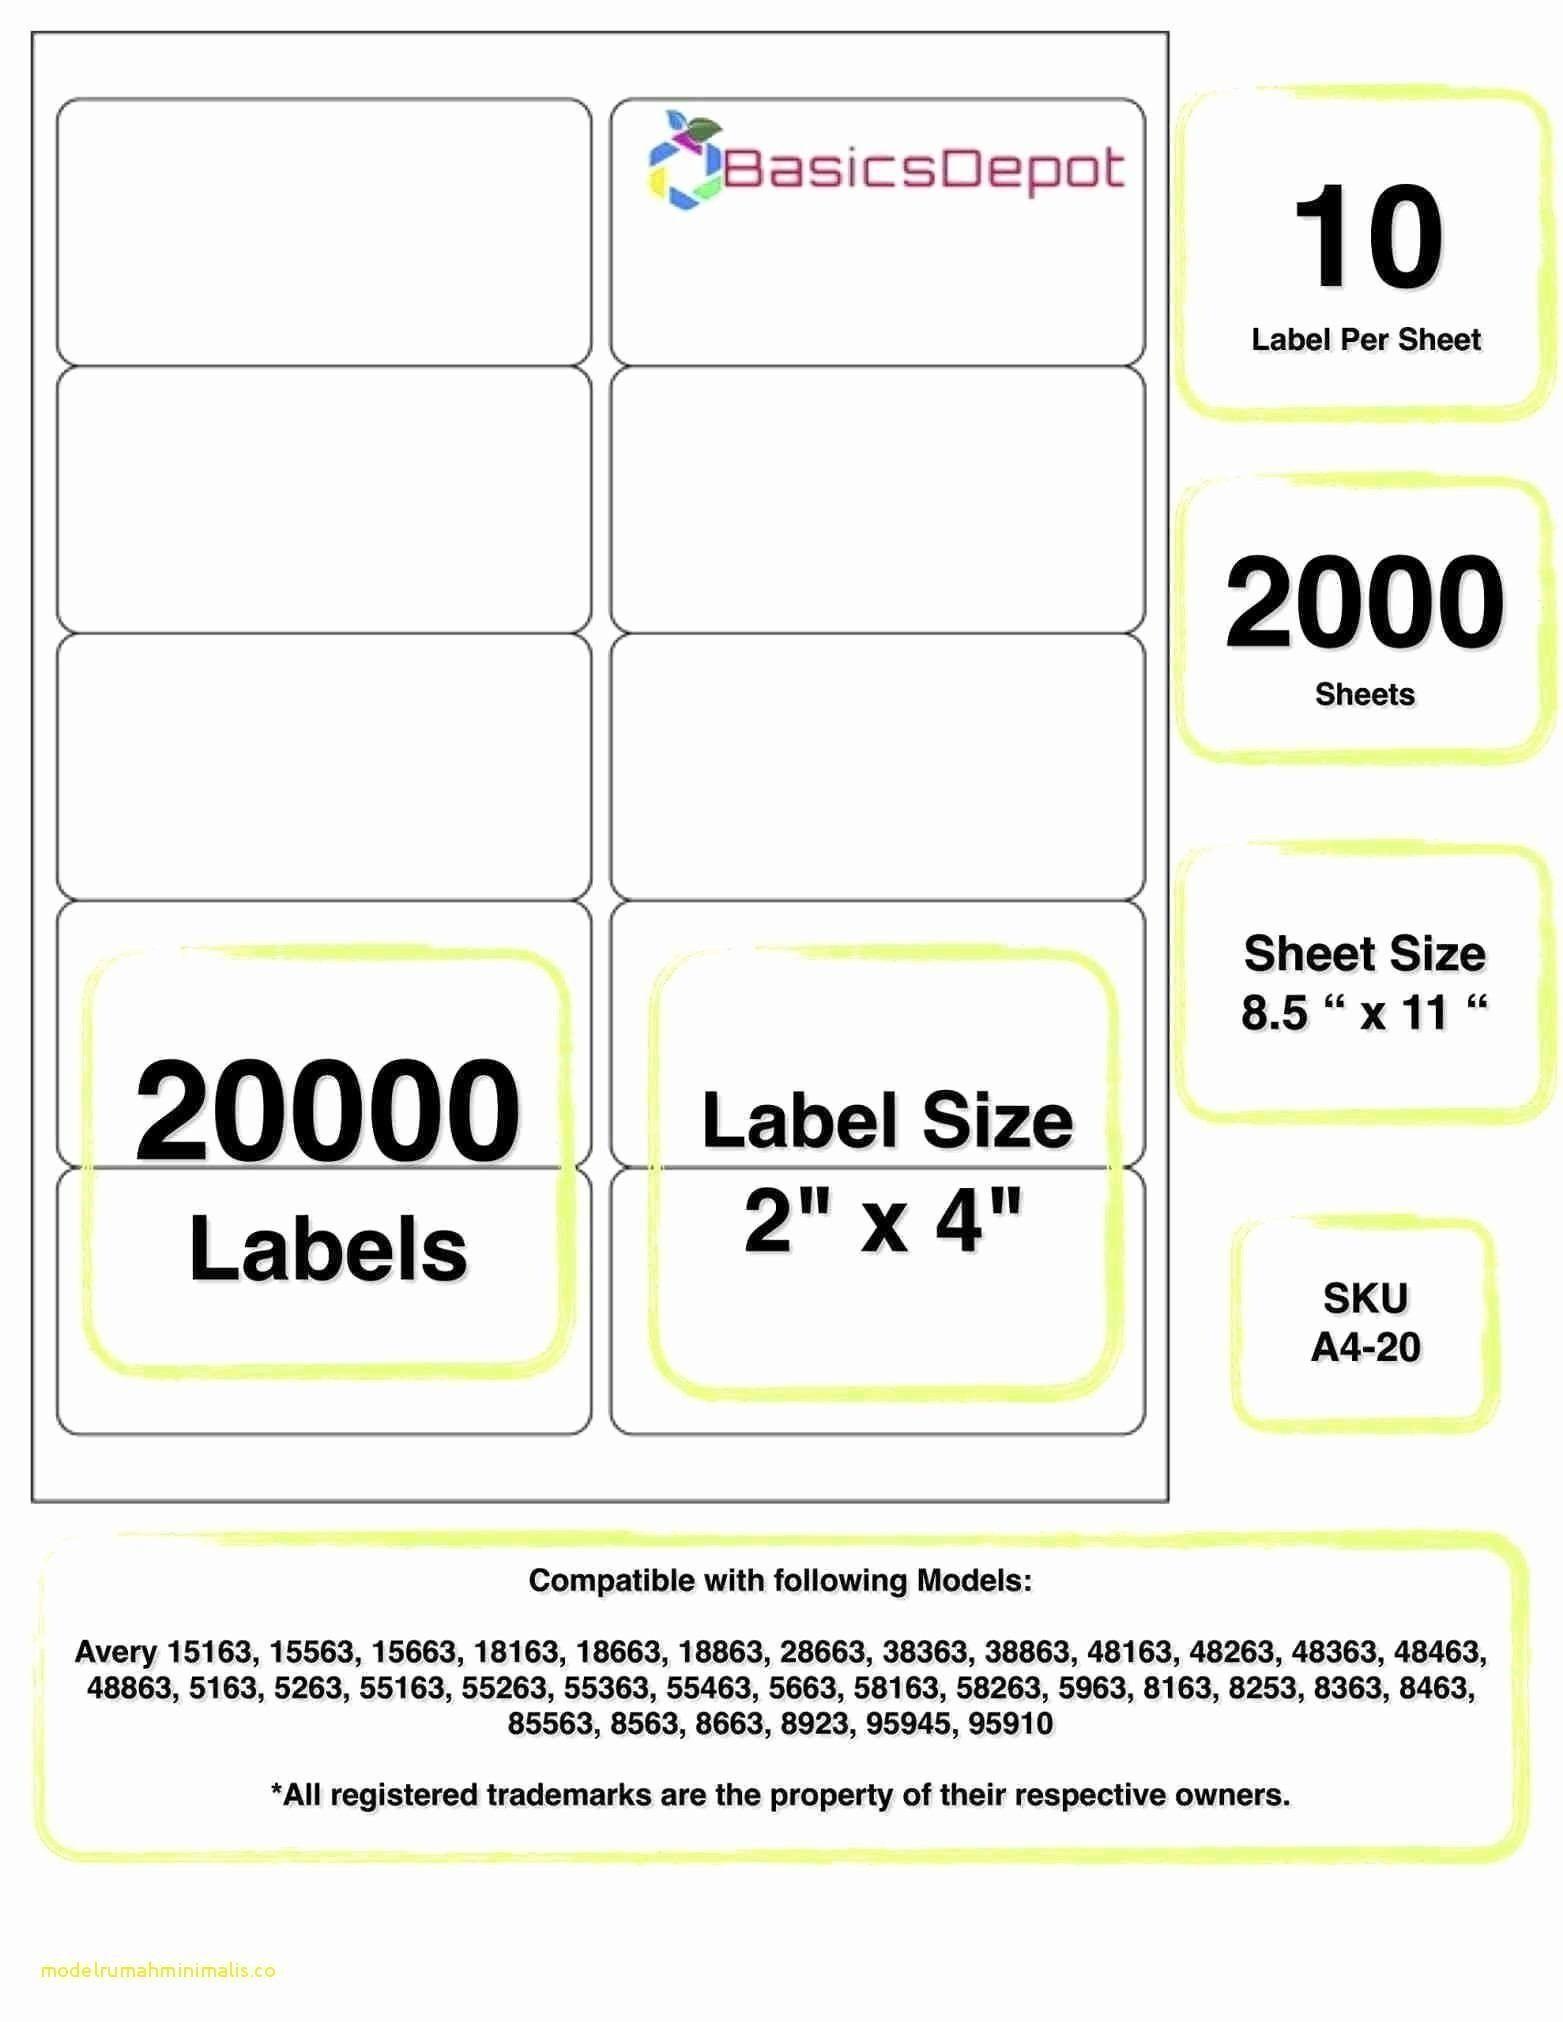 Avery Label Template 18160 : avery, label, template, 18160, Avery, Labels, Template, Download, Label, Templates,, Printable, Templates